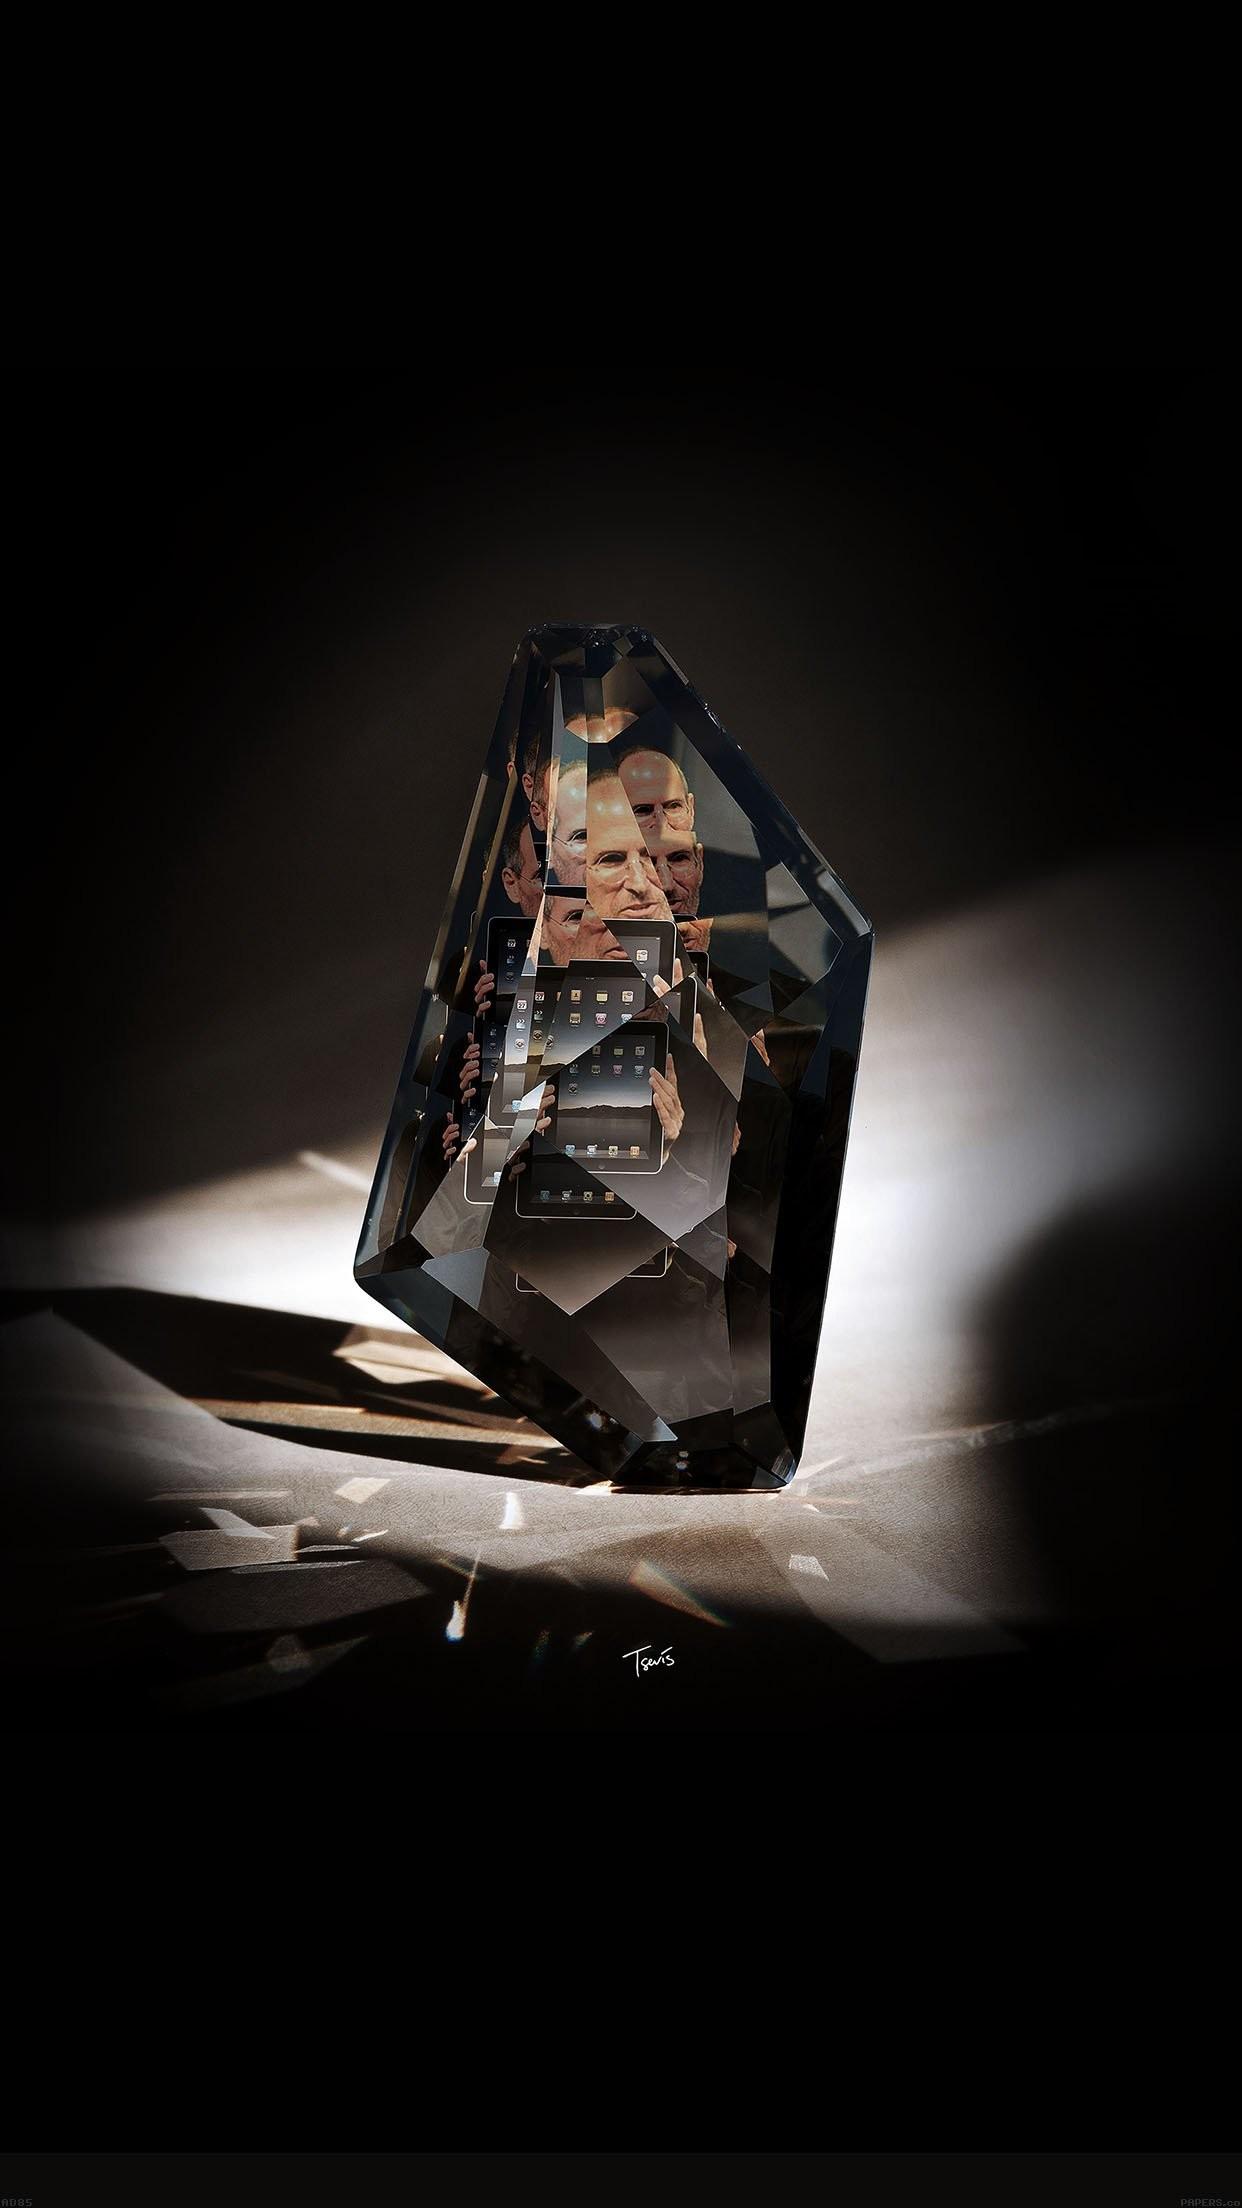 steve jobs diamond art apple ios8 iphone 7 wallpaper